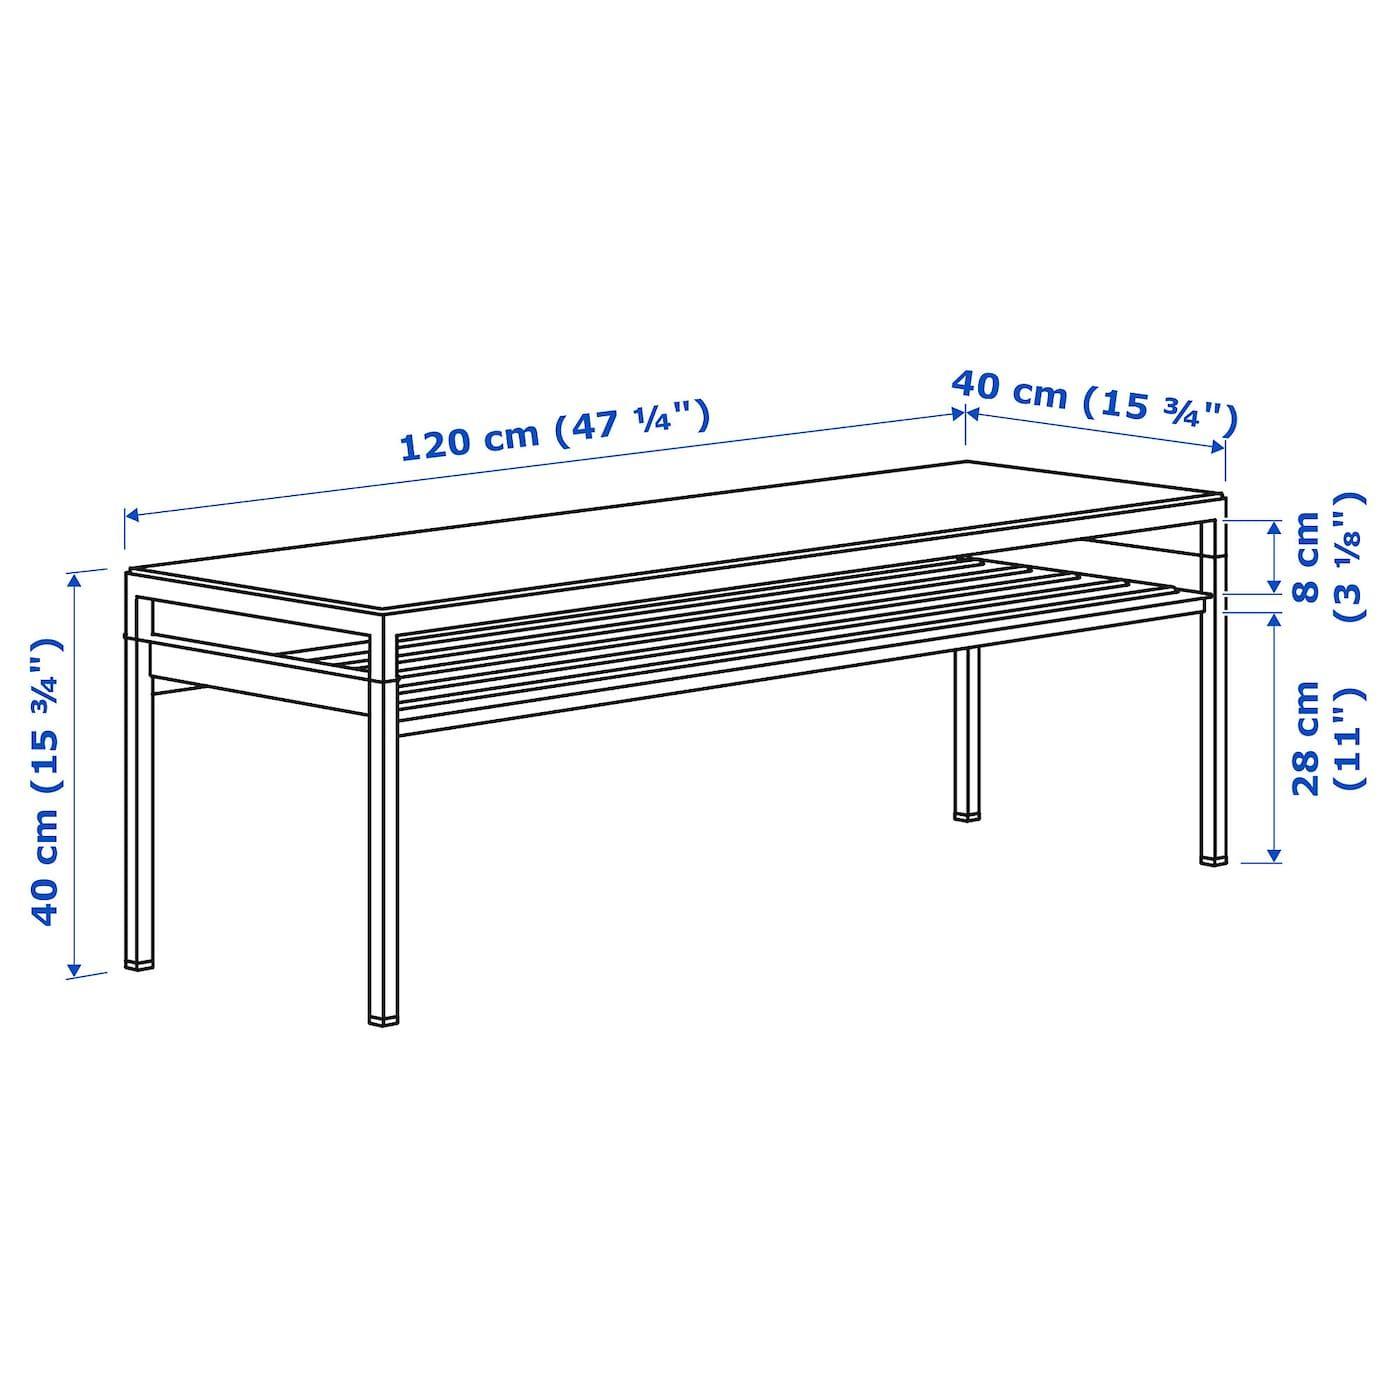 Nyboda Coffee Table W Reversible Table Top Black Beige Ikea Couchtisch Tabletop Ikea [ 1400 x 1400 Pixel ]